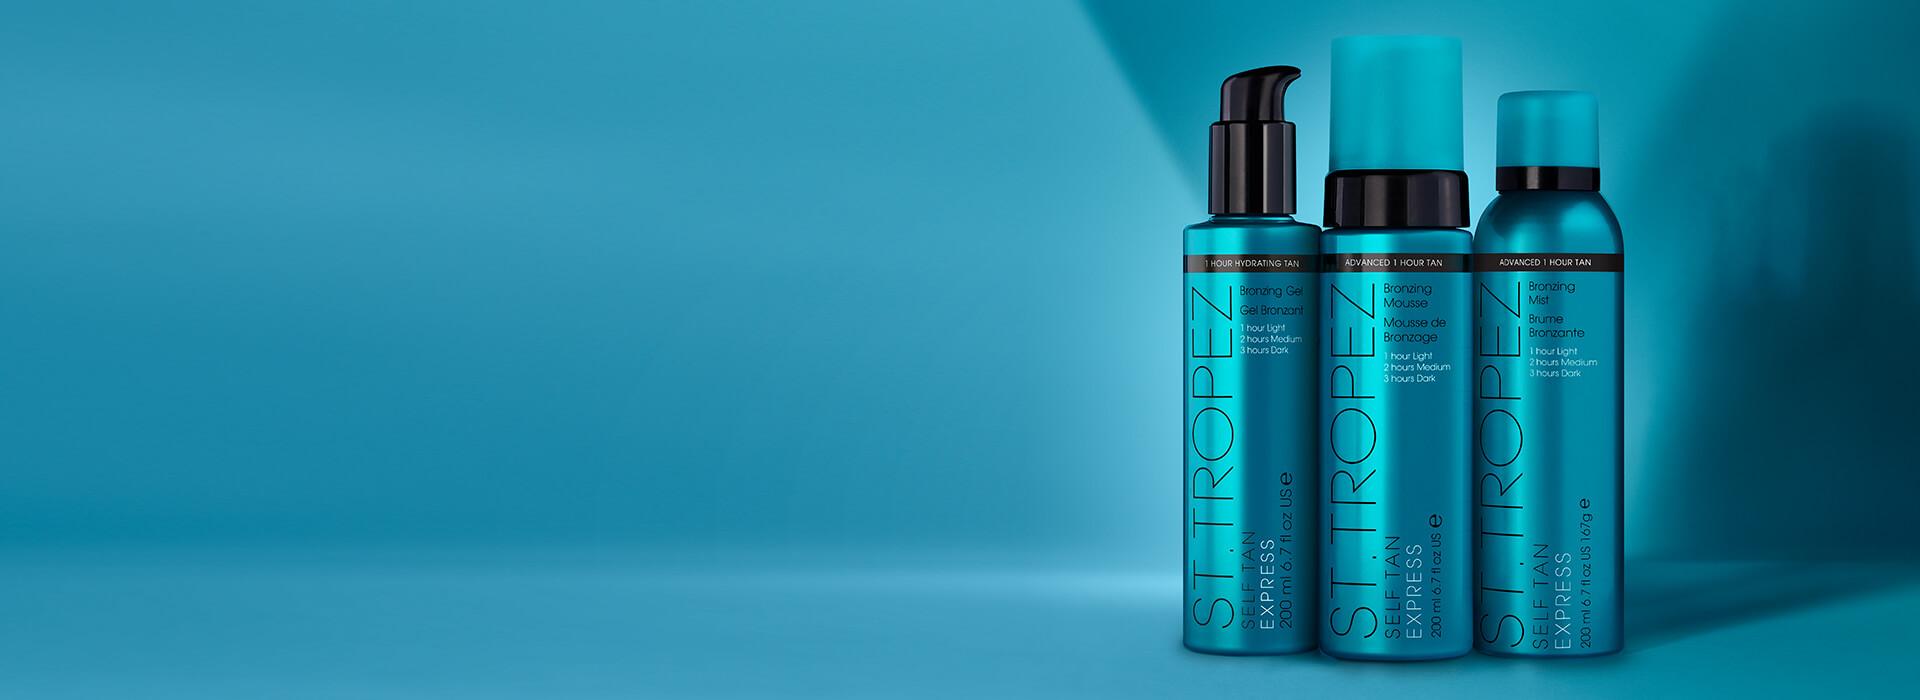 St.Tropez products